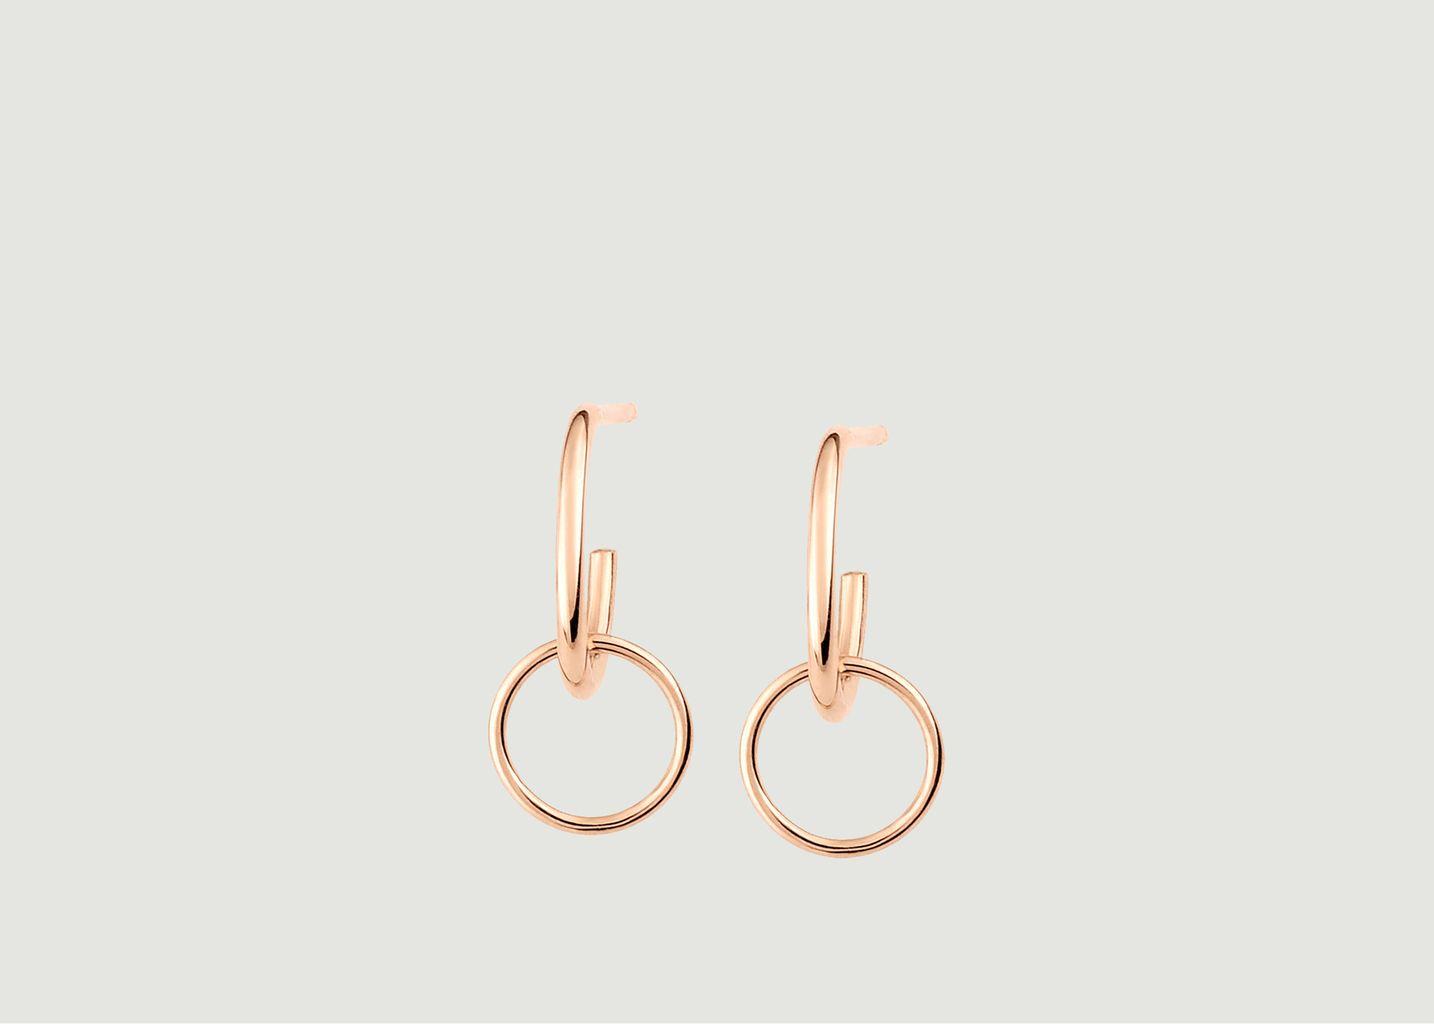 Boucles d'oreilles Tiny Circle Drop - Ginette NY